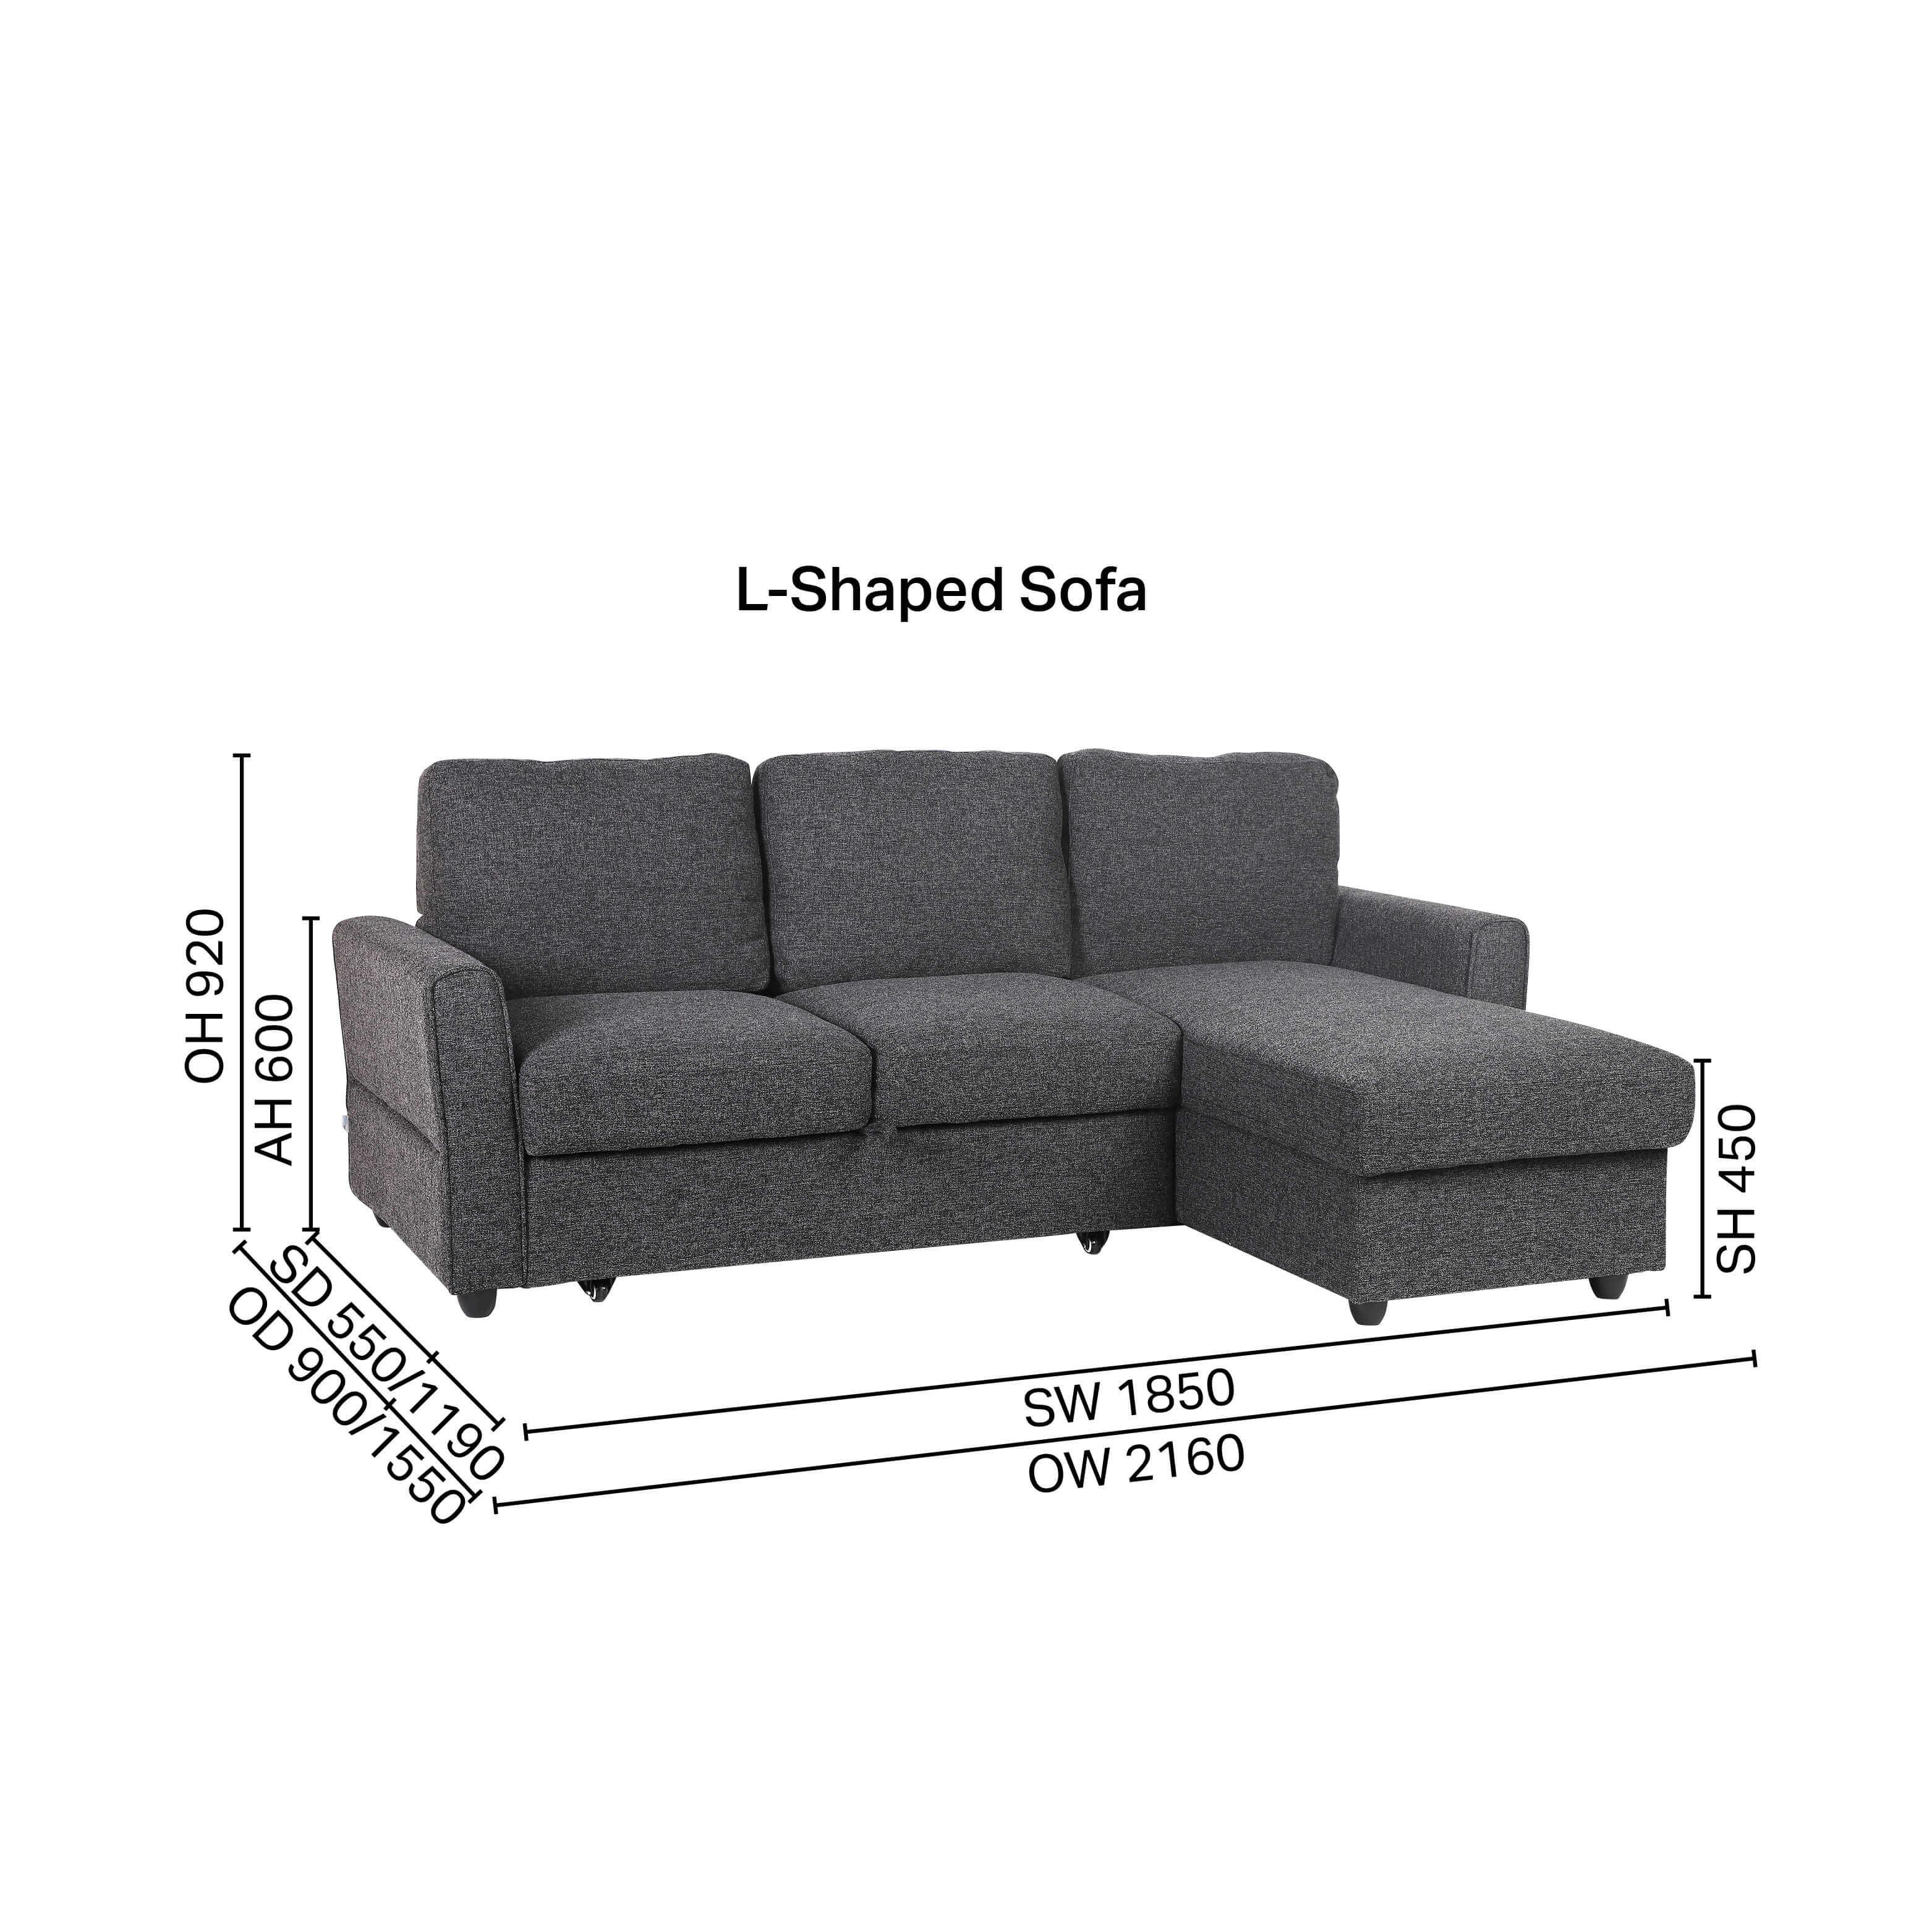 Leonard L-Shaped Sofa / Sofabed / Storage